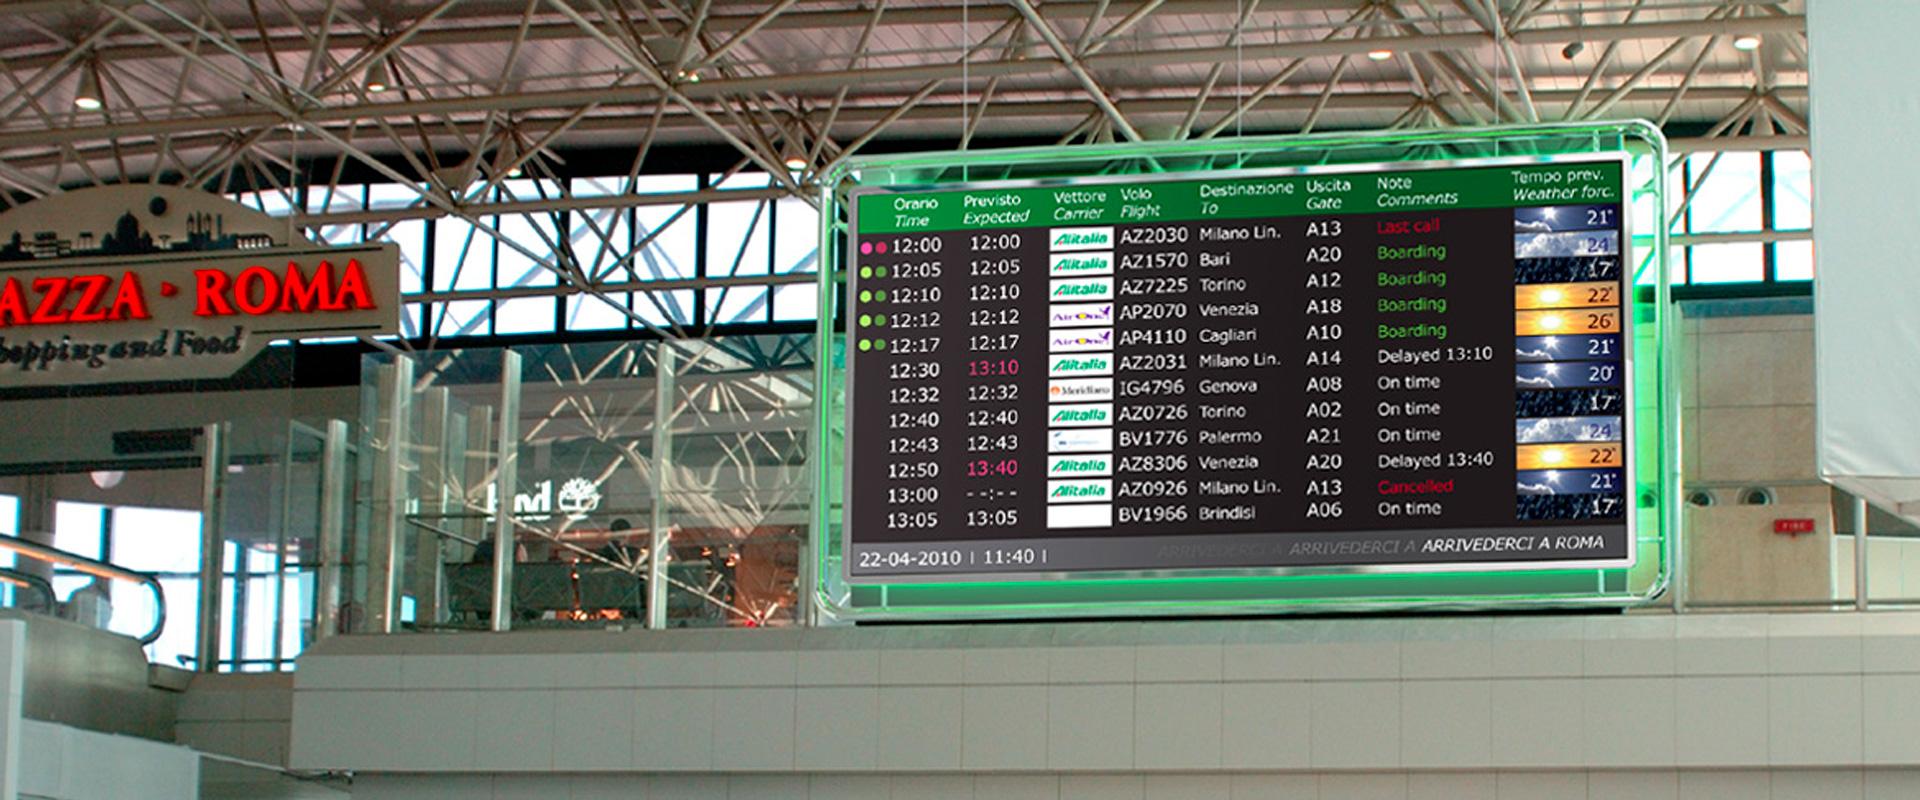 timetable-fiumicino